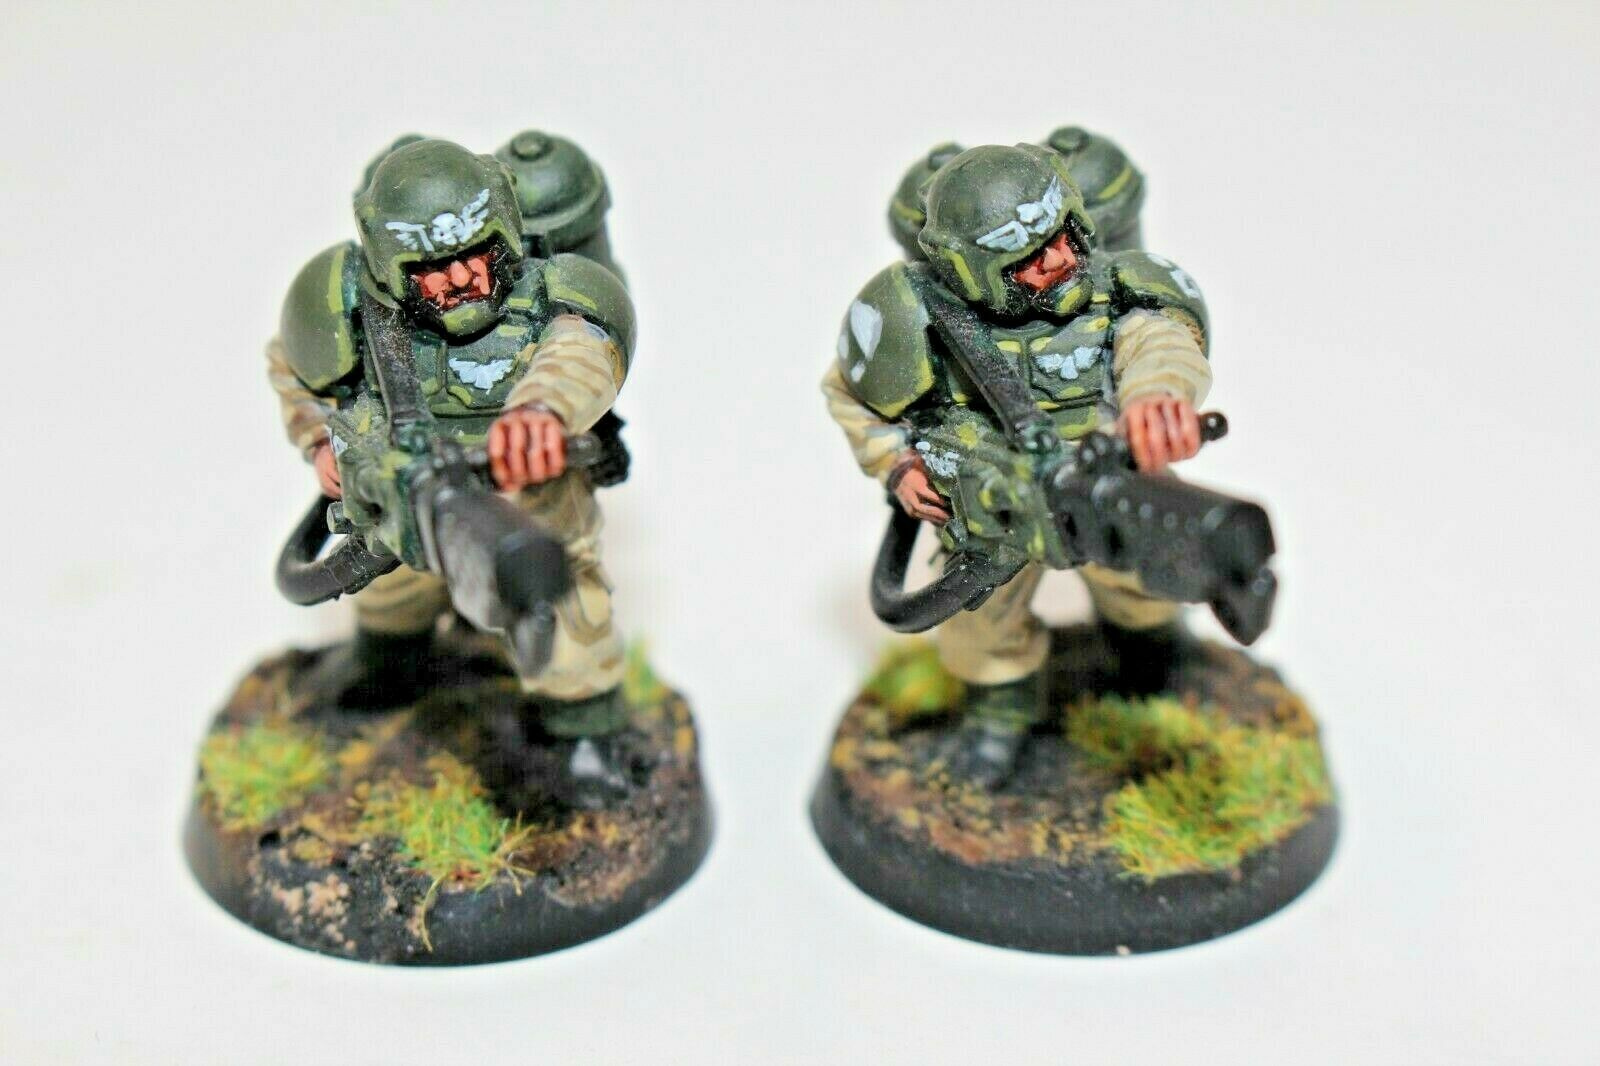 Warhammer Guardia Imperial Cadian con Flamers bien pintados-JYS83